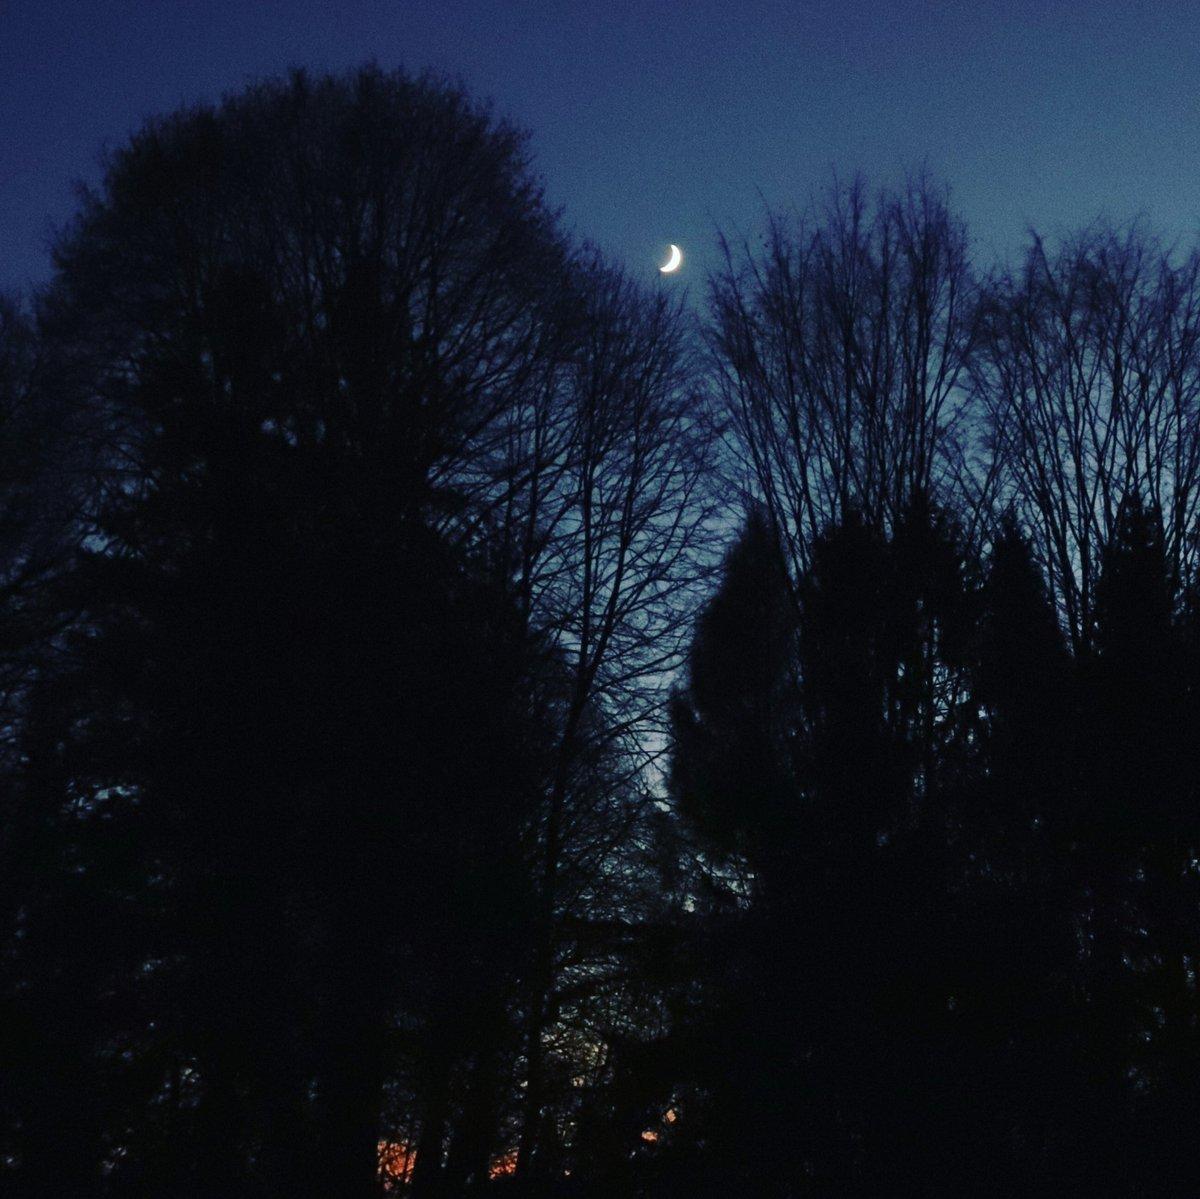 #Sonnenuntergang